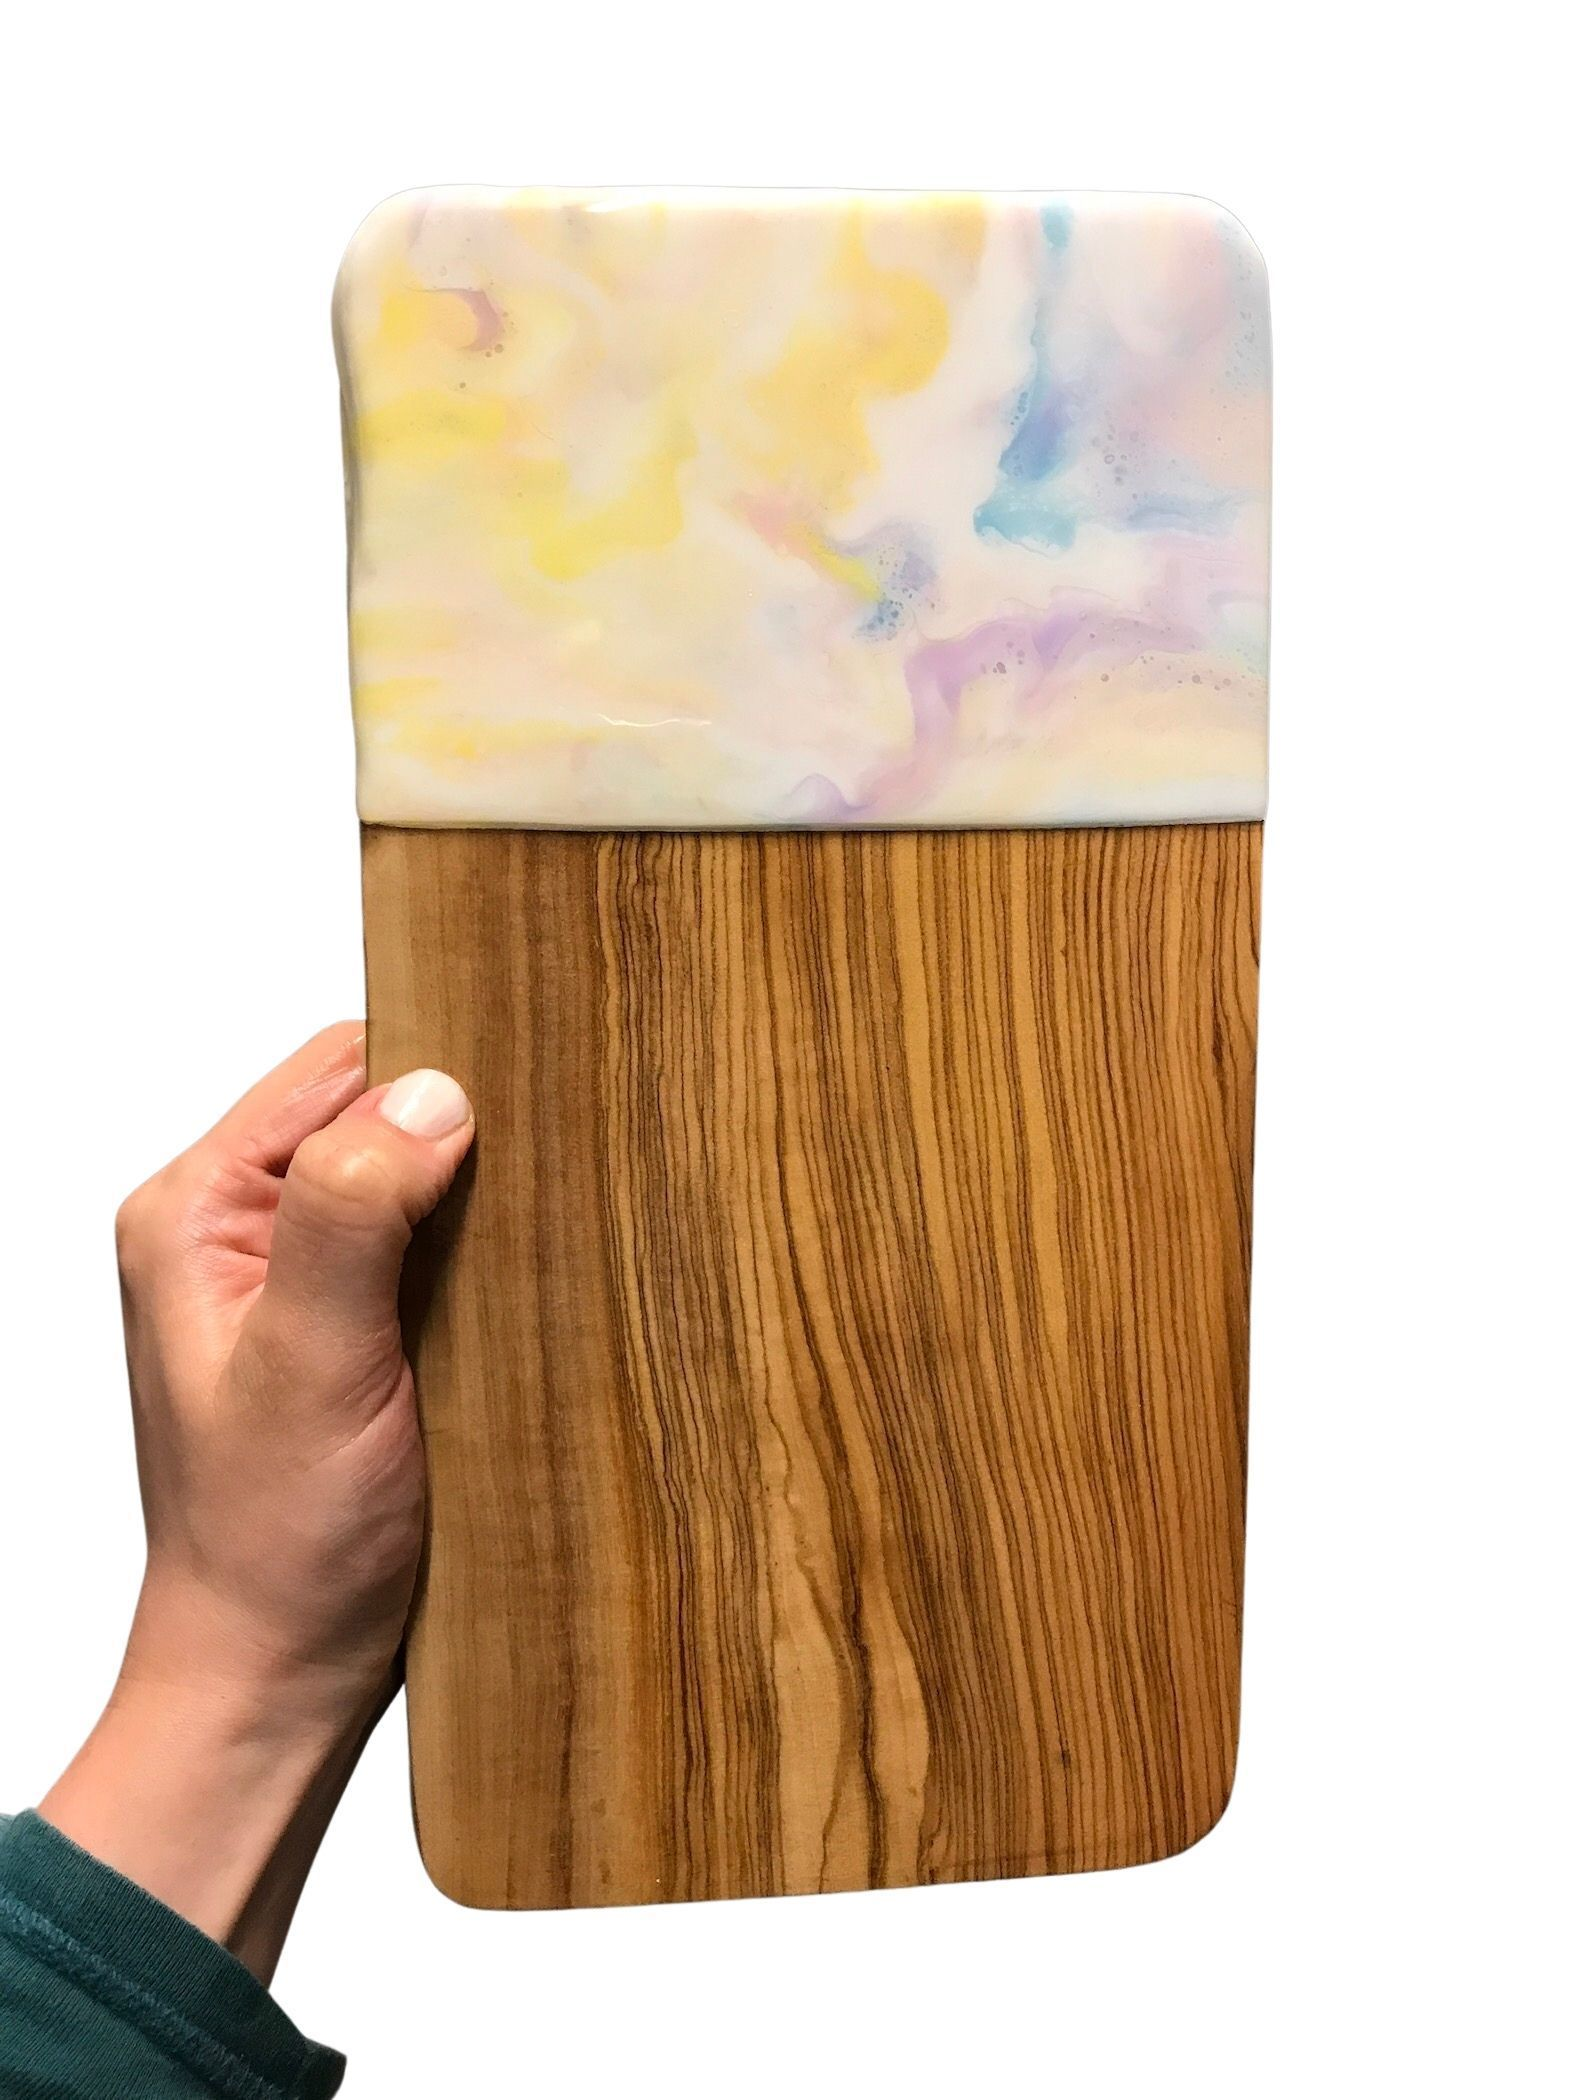 Pastel Tones Resin Art Chopping Board 30cm - Pastels Home Decor